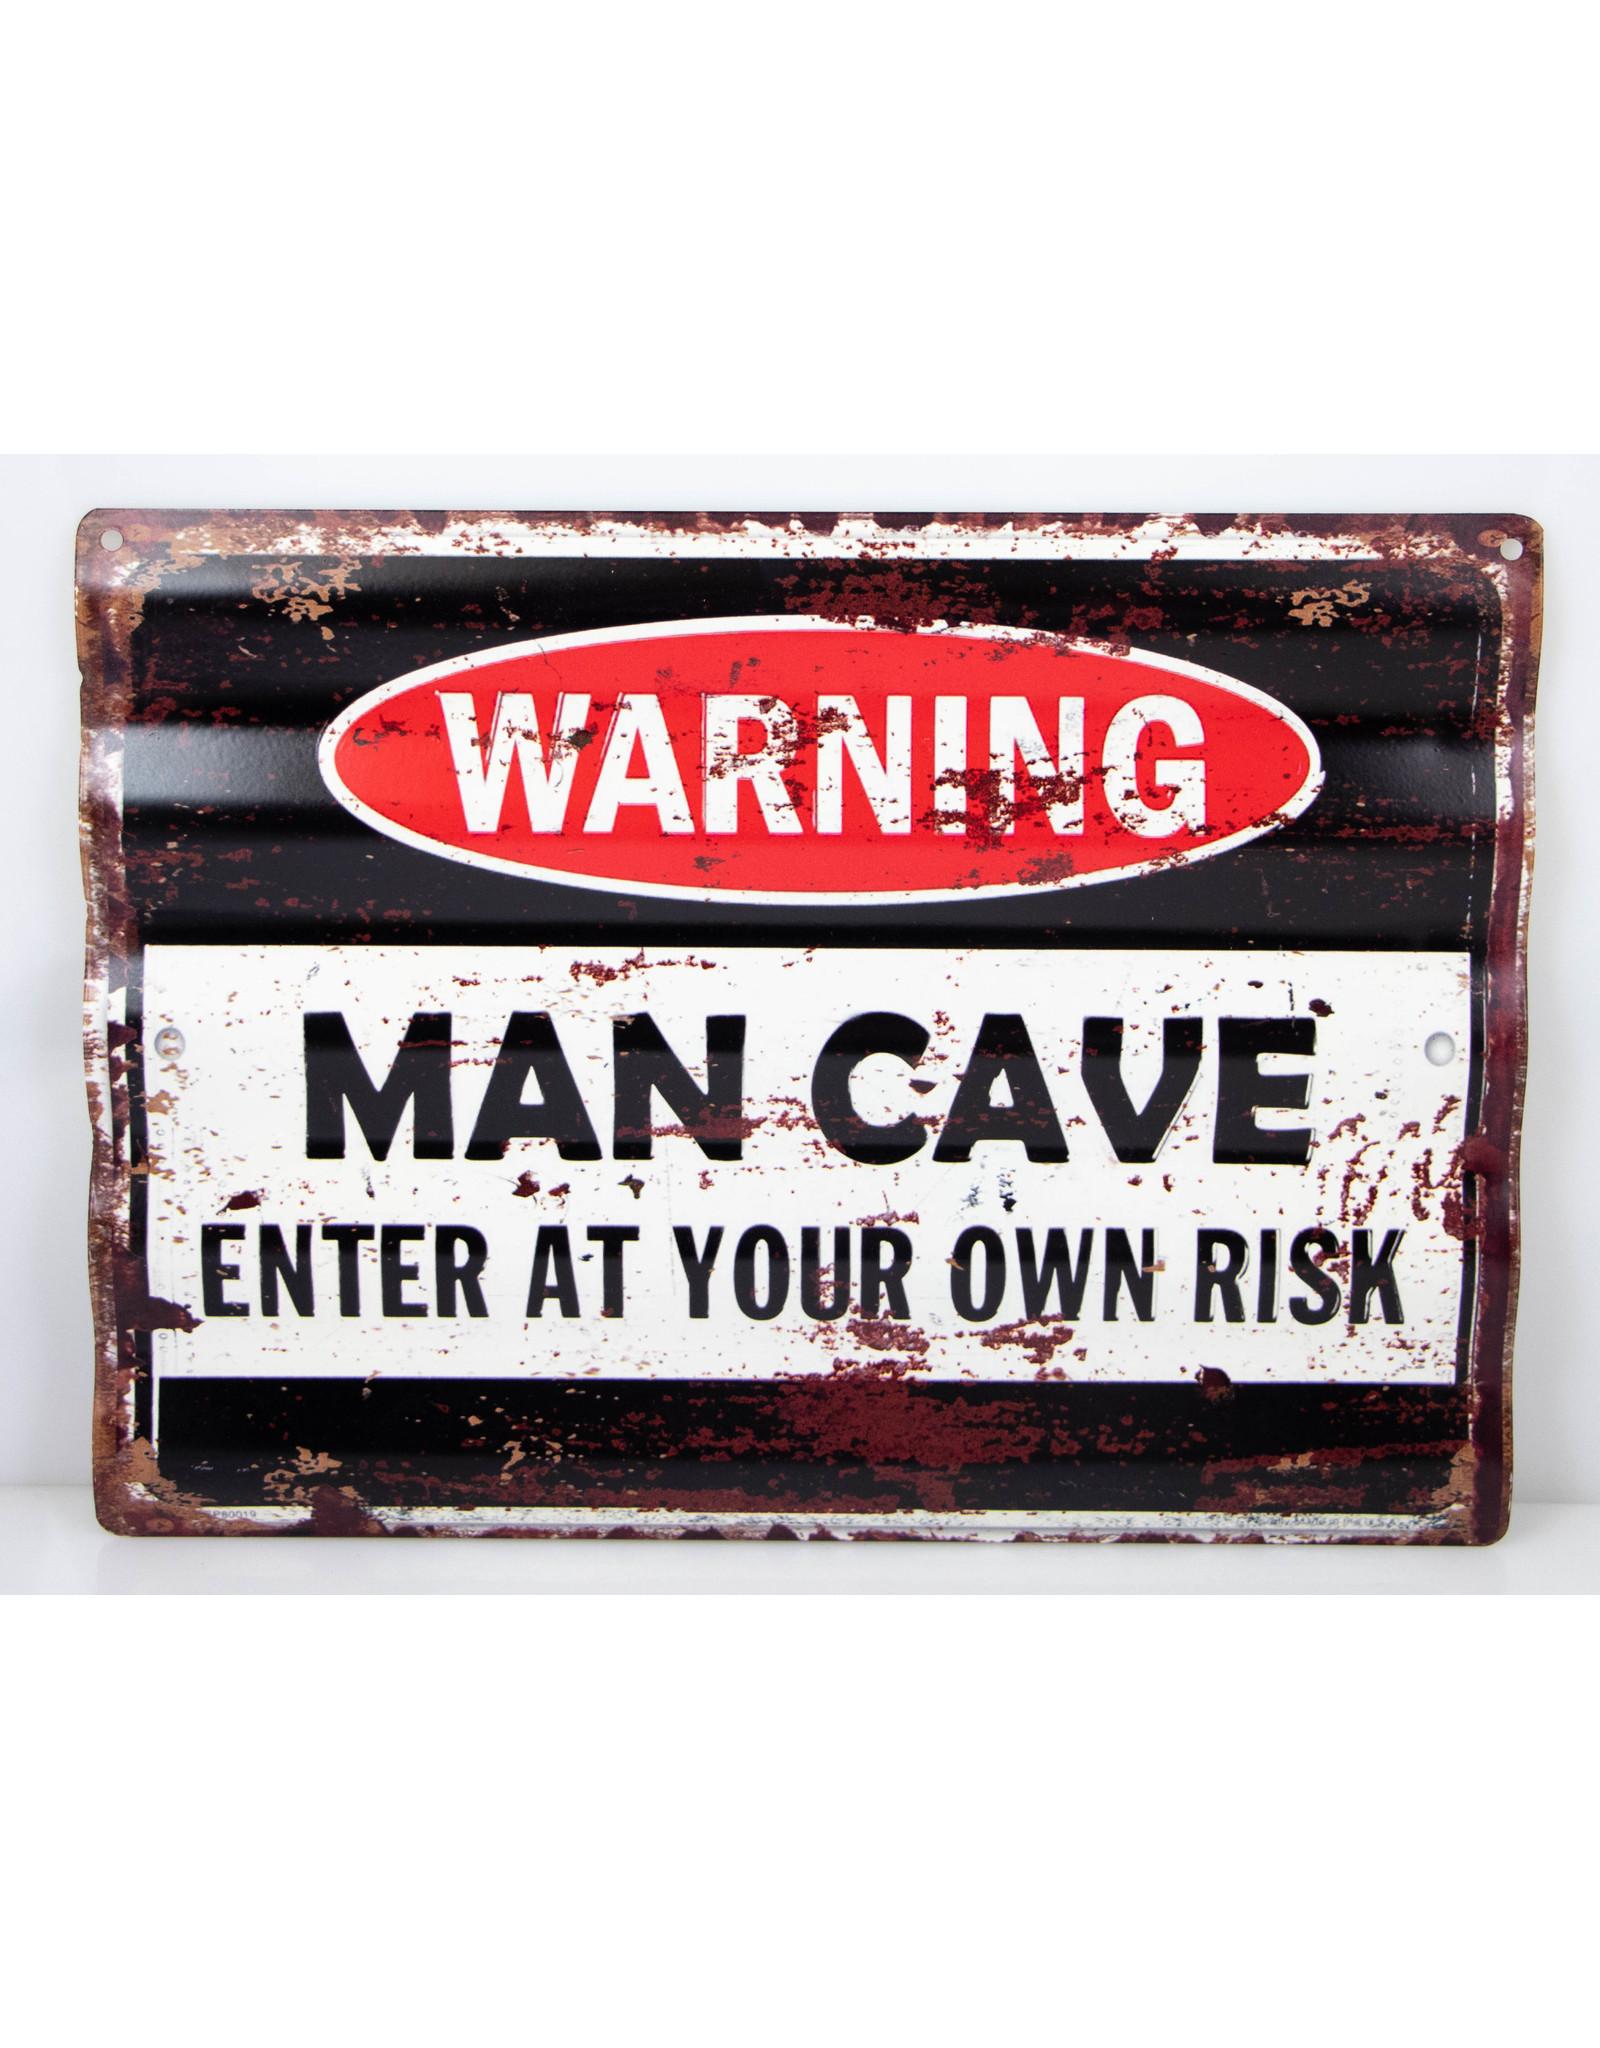 Warning man cave